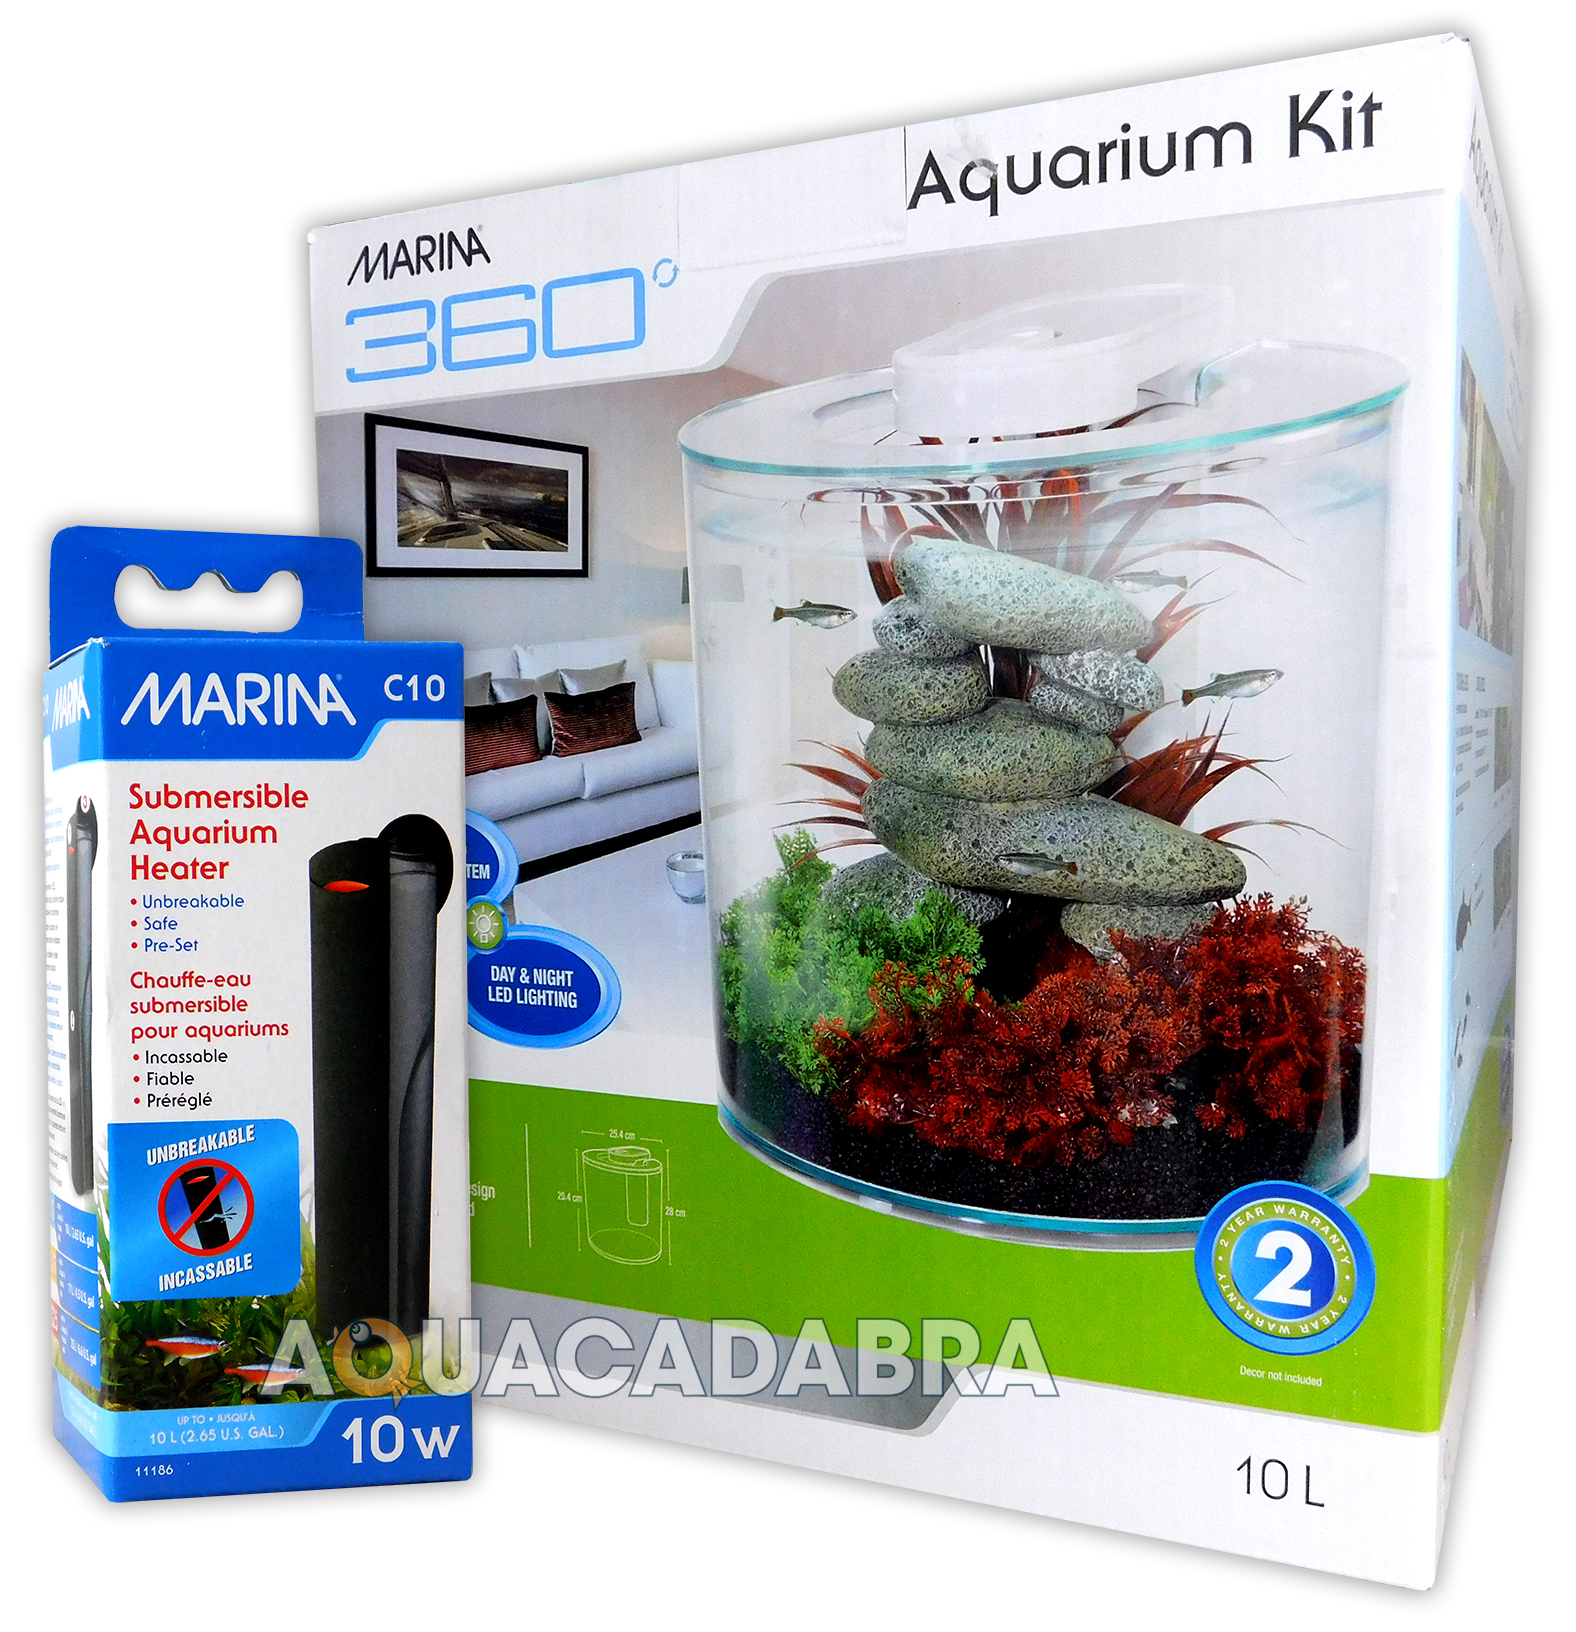 Cabinet aquarium fish tank tropical 60cm 2ft 100l - Hagen Marina 360 Aquarium Kit With 42 95 Buy It Now 68l Cabinet Aquarium Fish Tank Tropical Marine 60cm 2ft